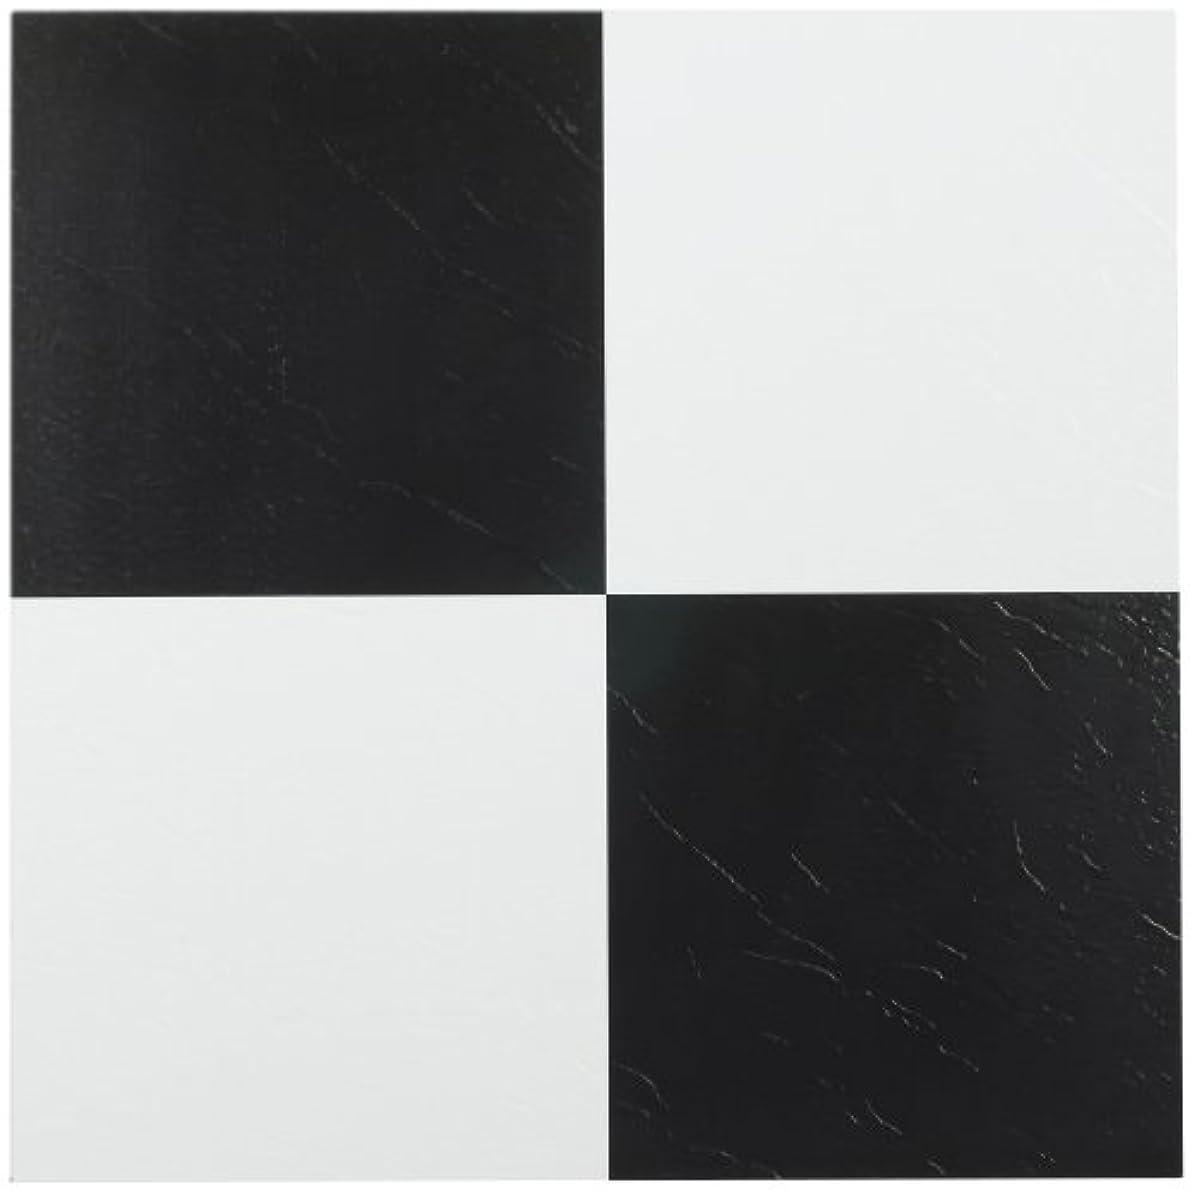 Black And White Vinyl Tiles Peel And Stick Floor Self